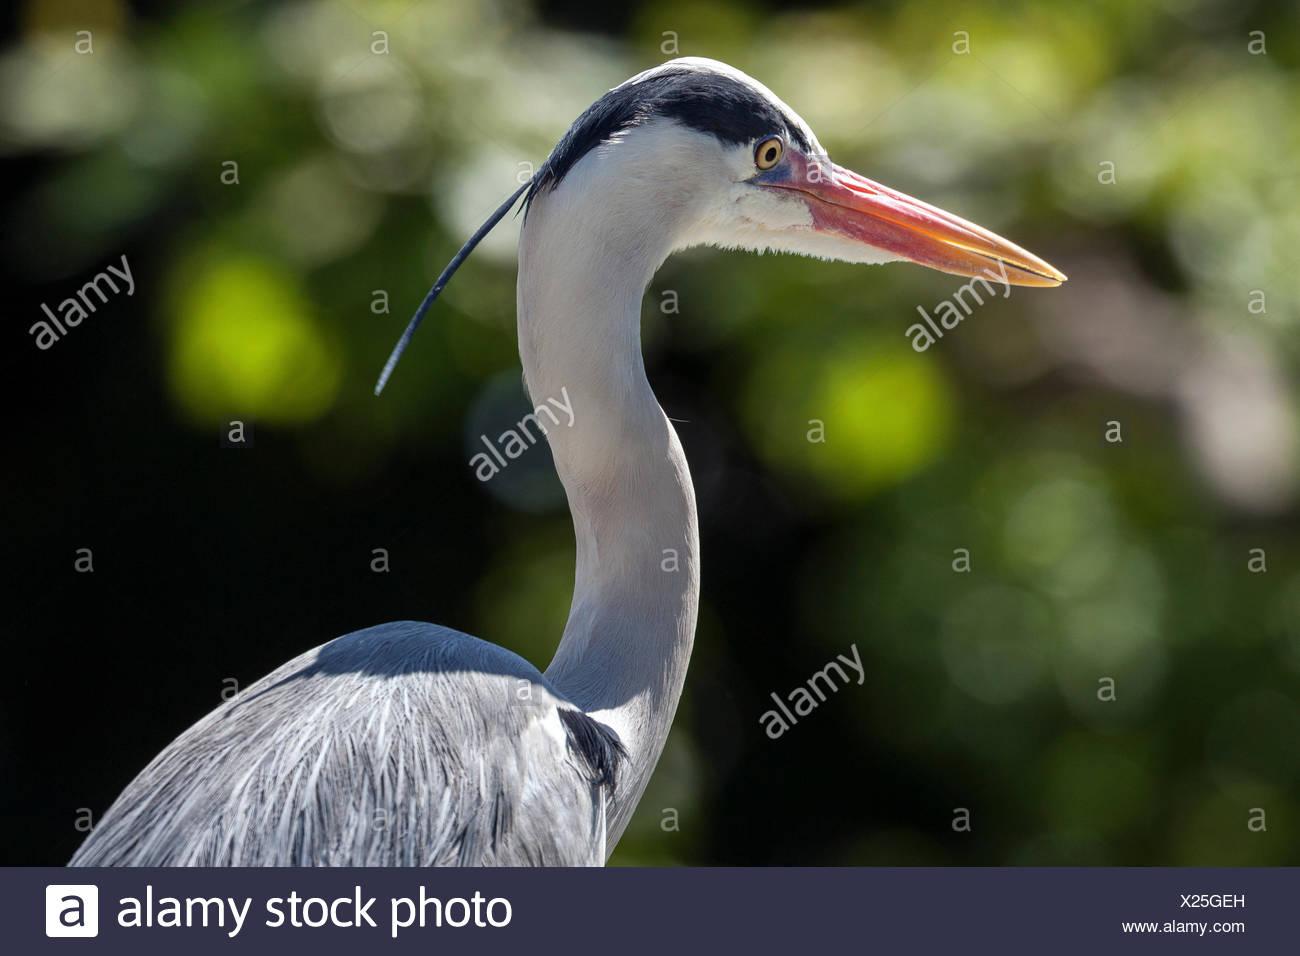 Grey heron (Ardea cinerea), Baden-Württemberg, Germany - Stock Image